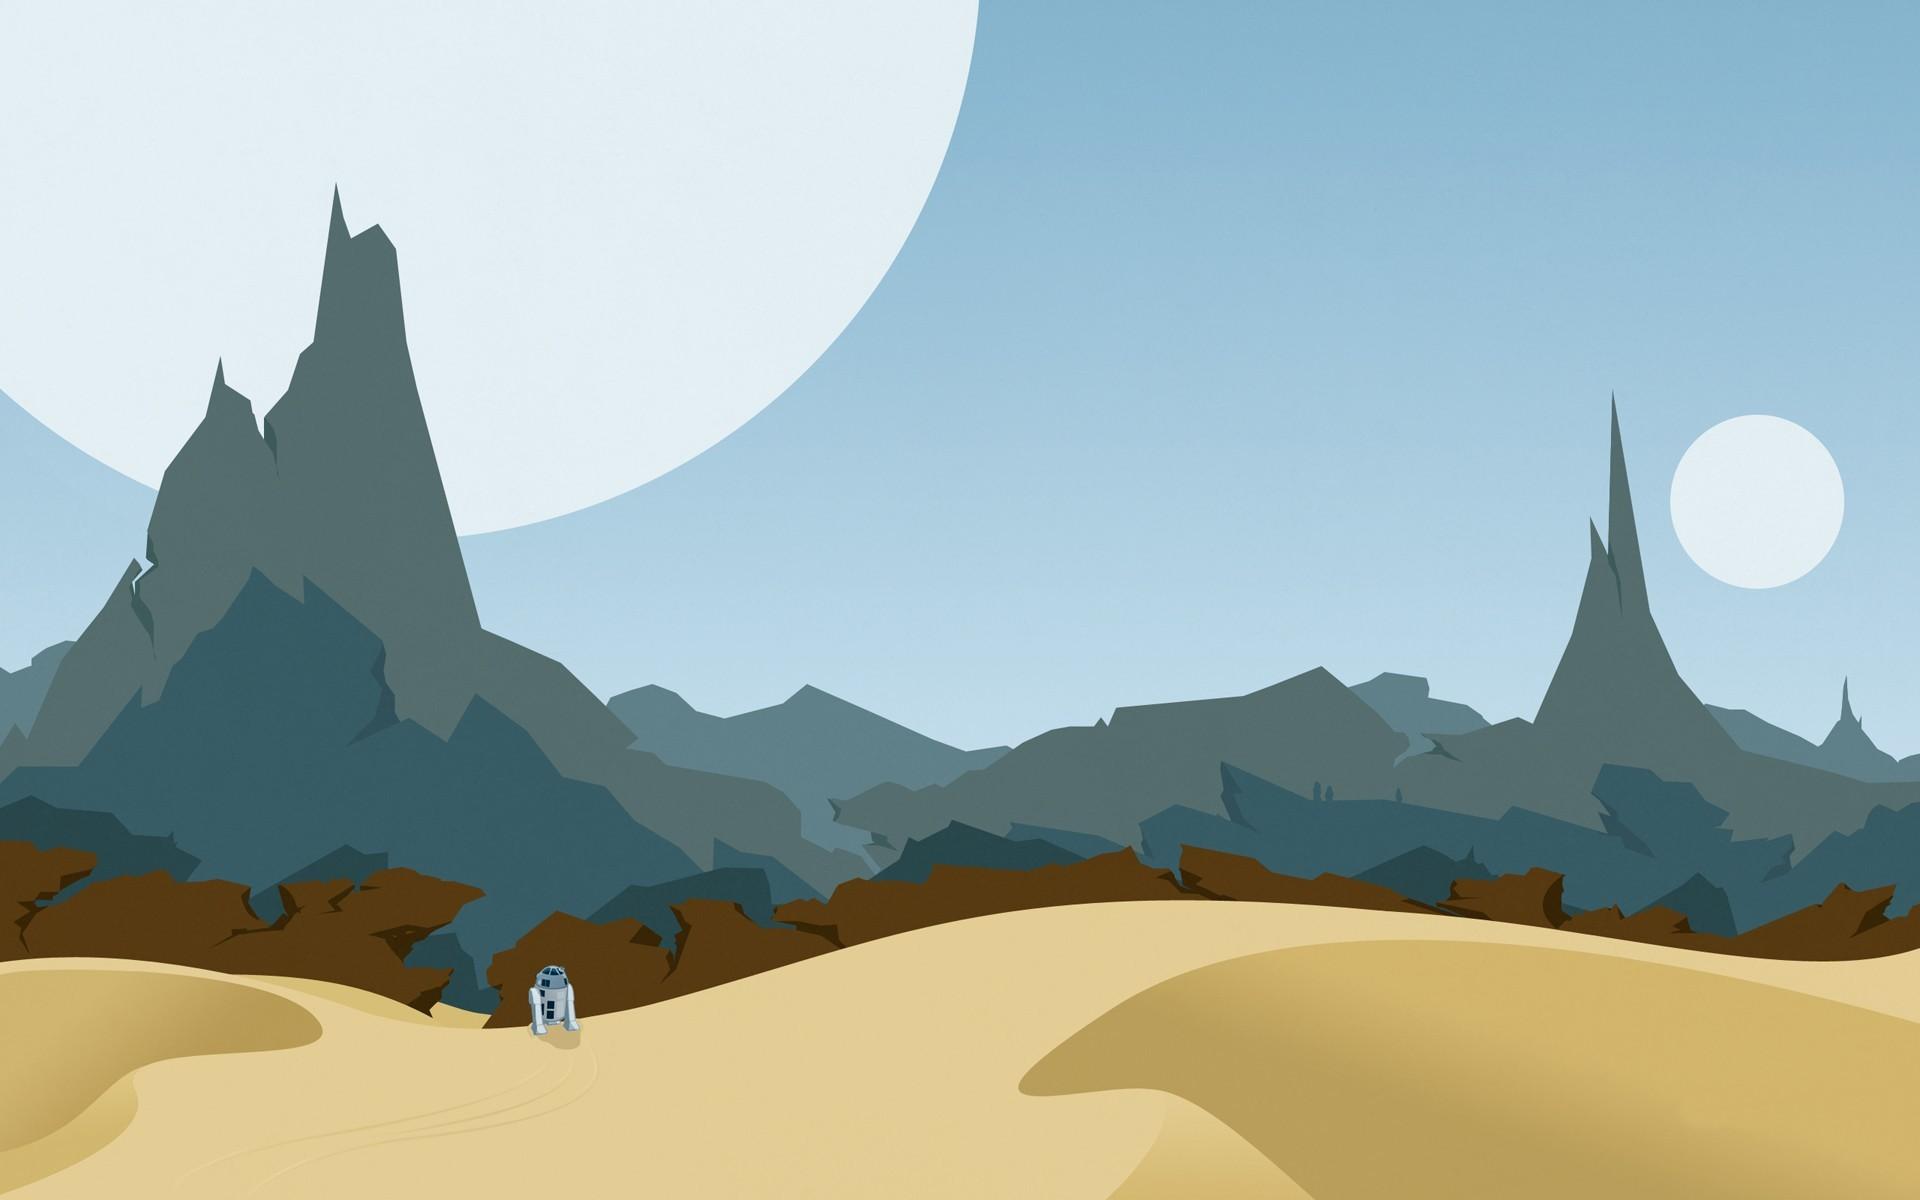 wallpaper R2-D2 · Star Wars